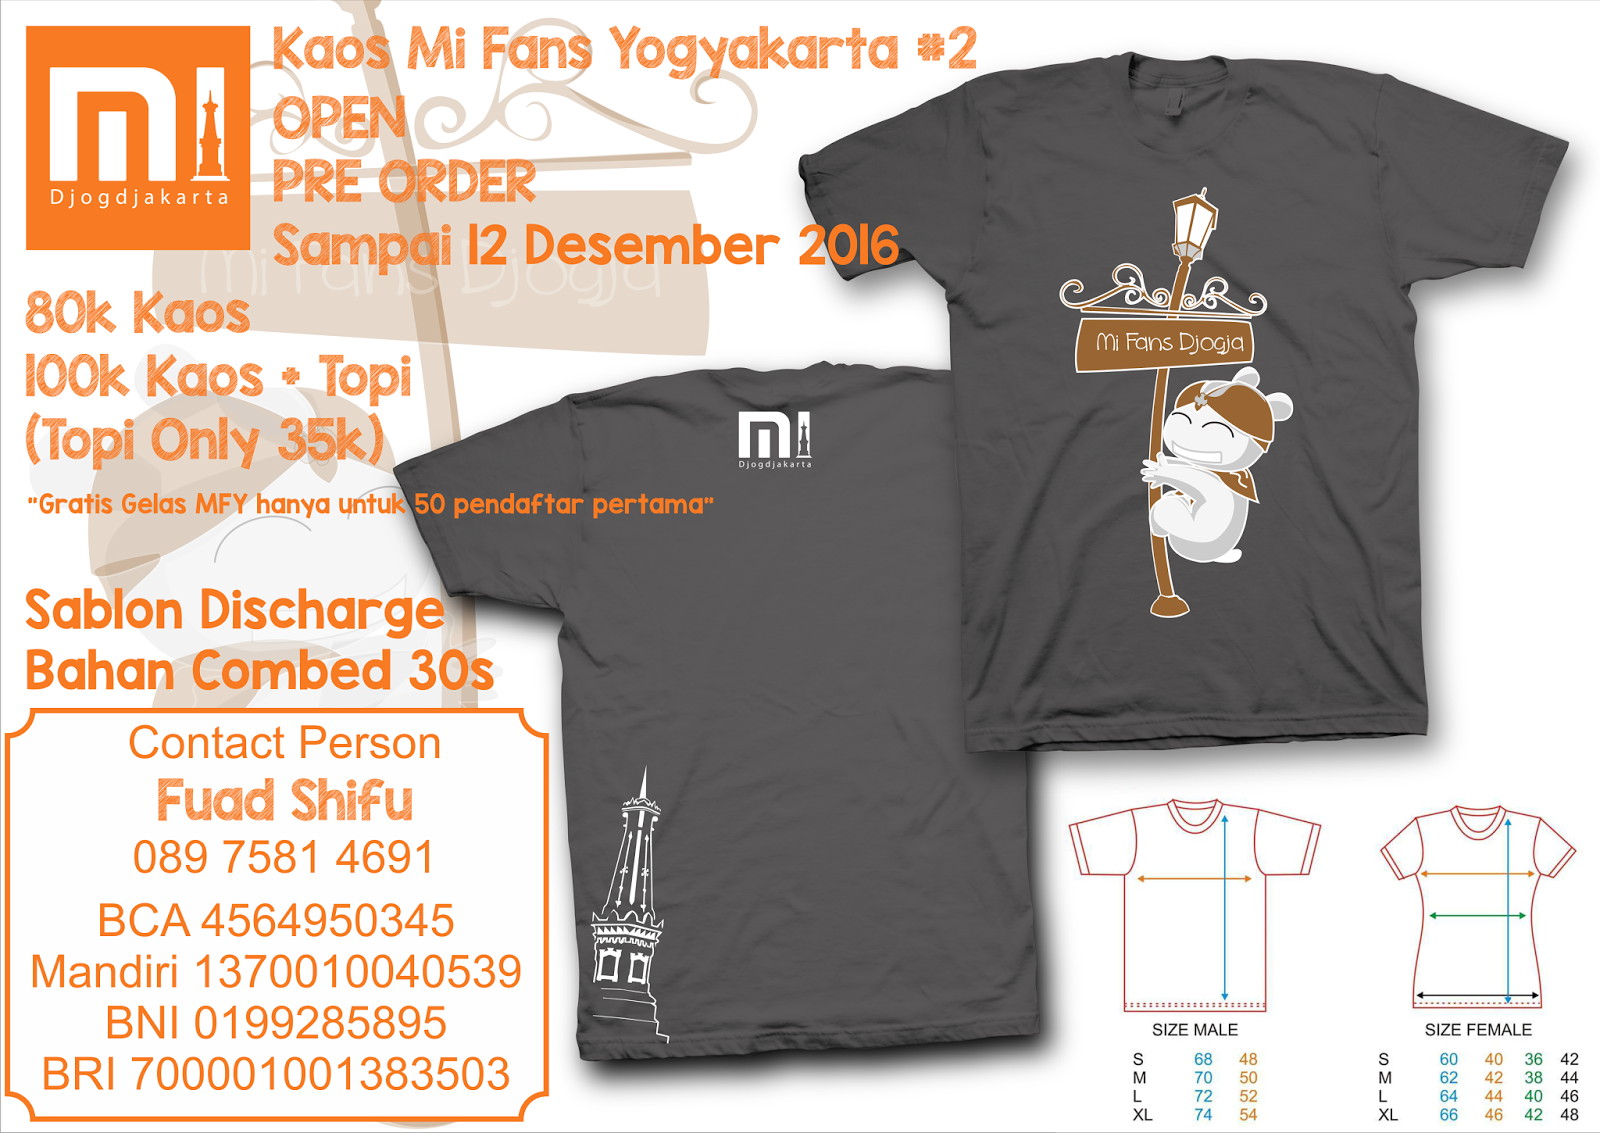 Pre Order Kaos 2 Mi Fans Regional Yogyakarta